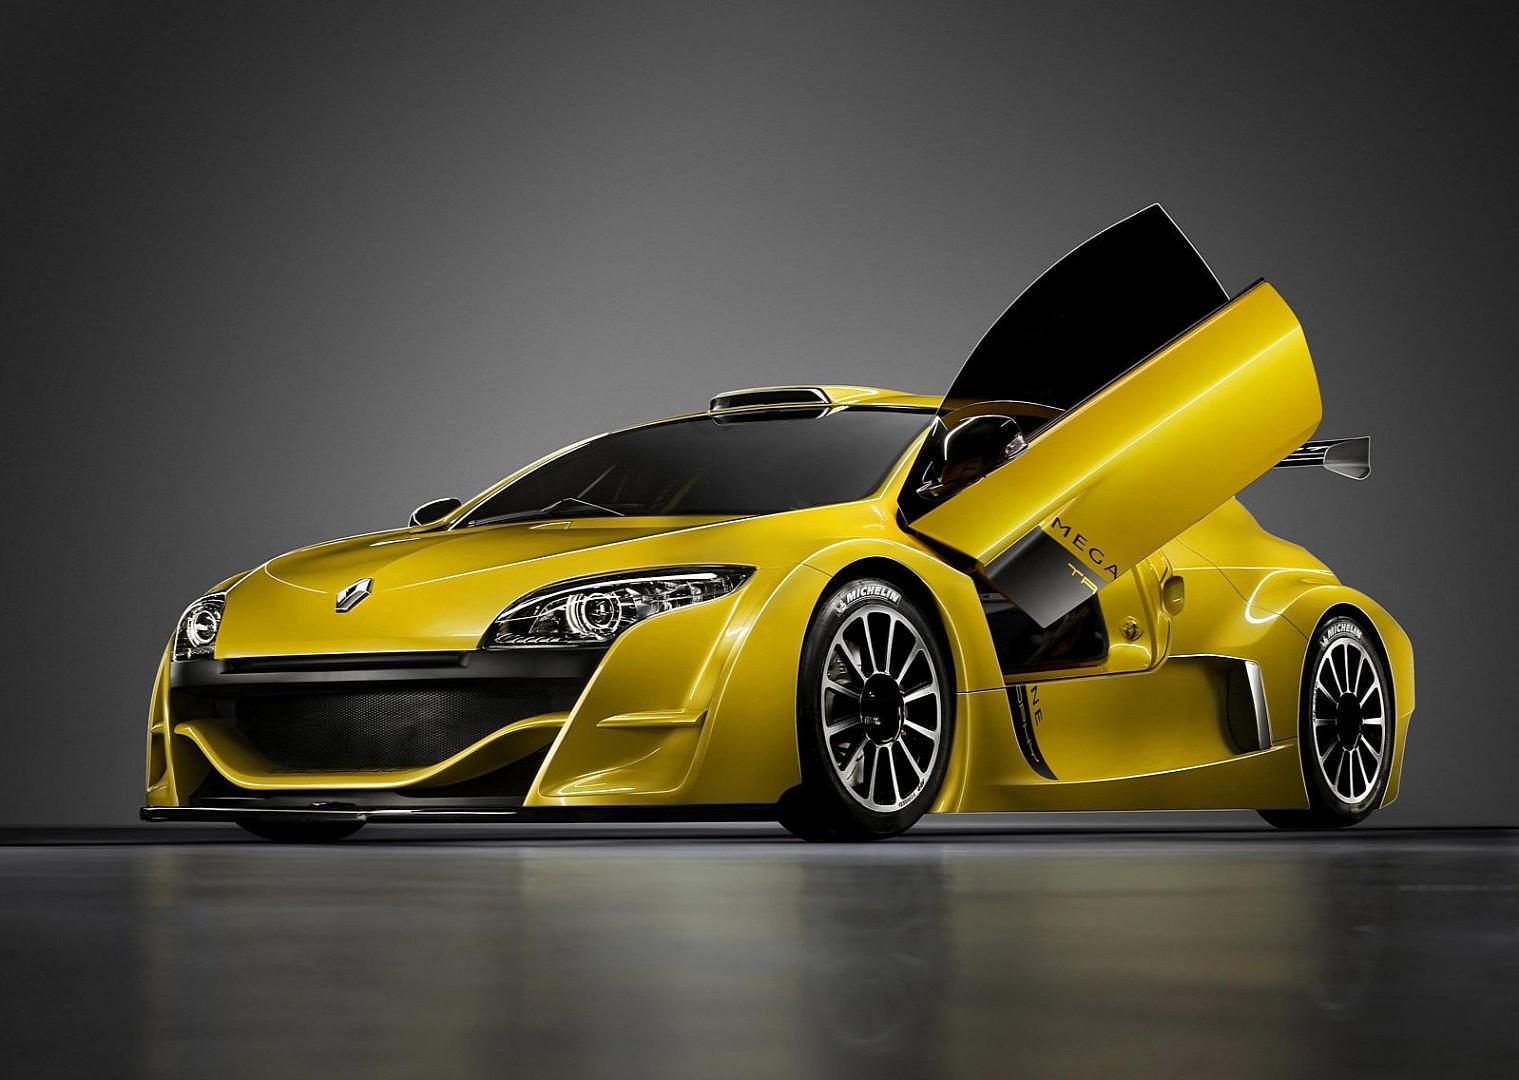 Megane trophy race car